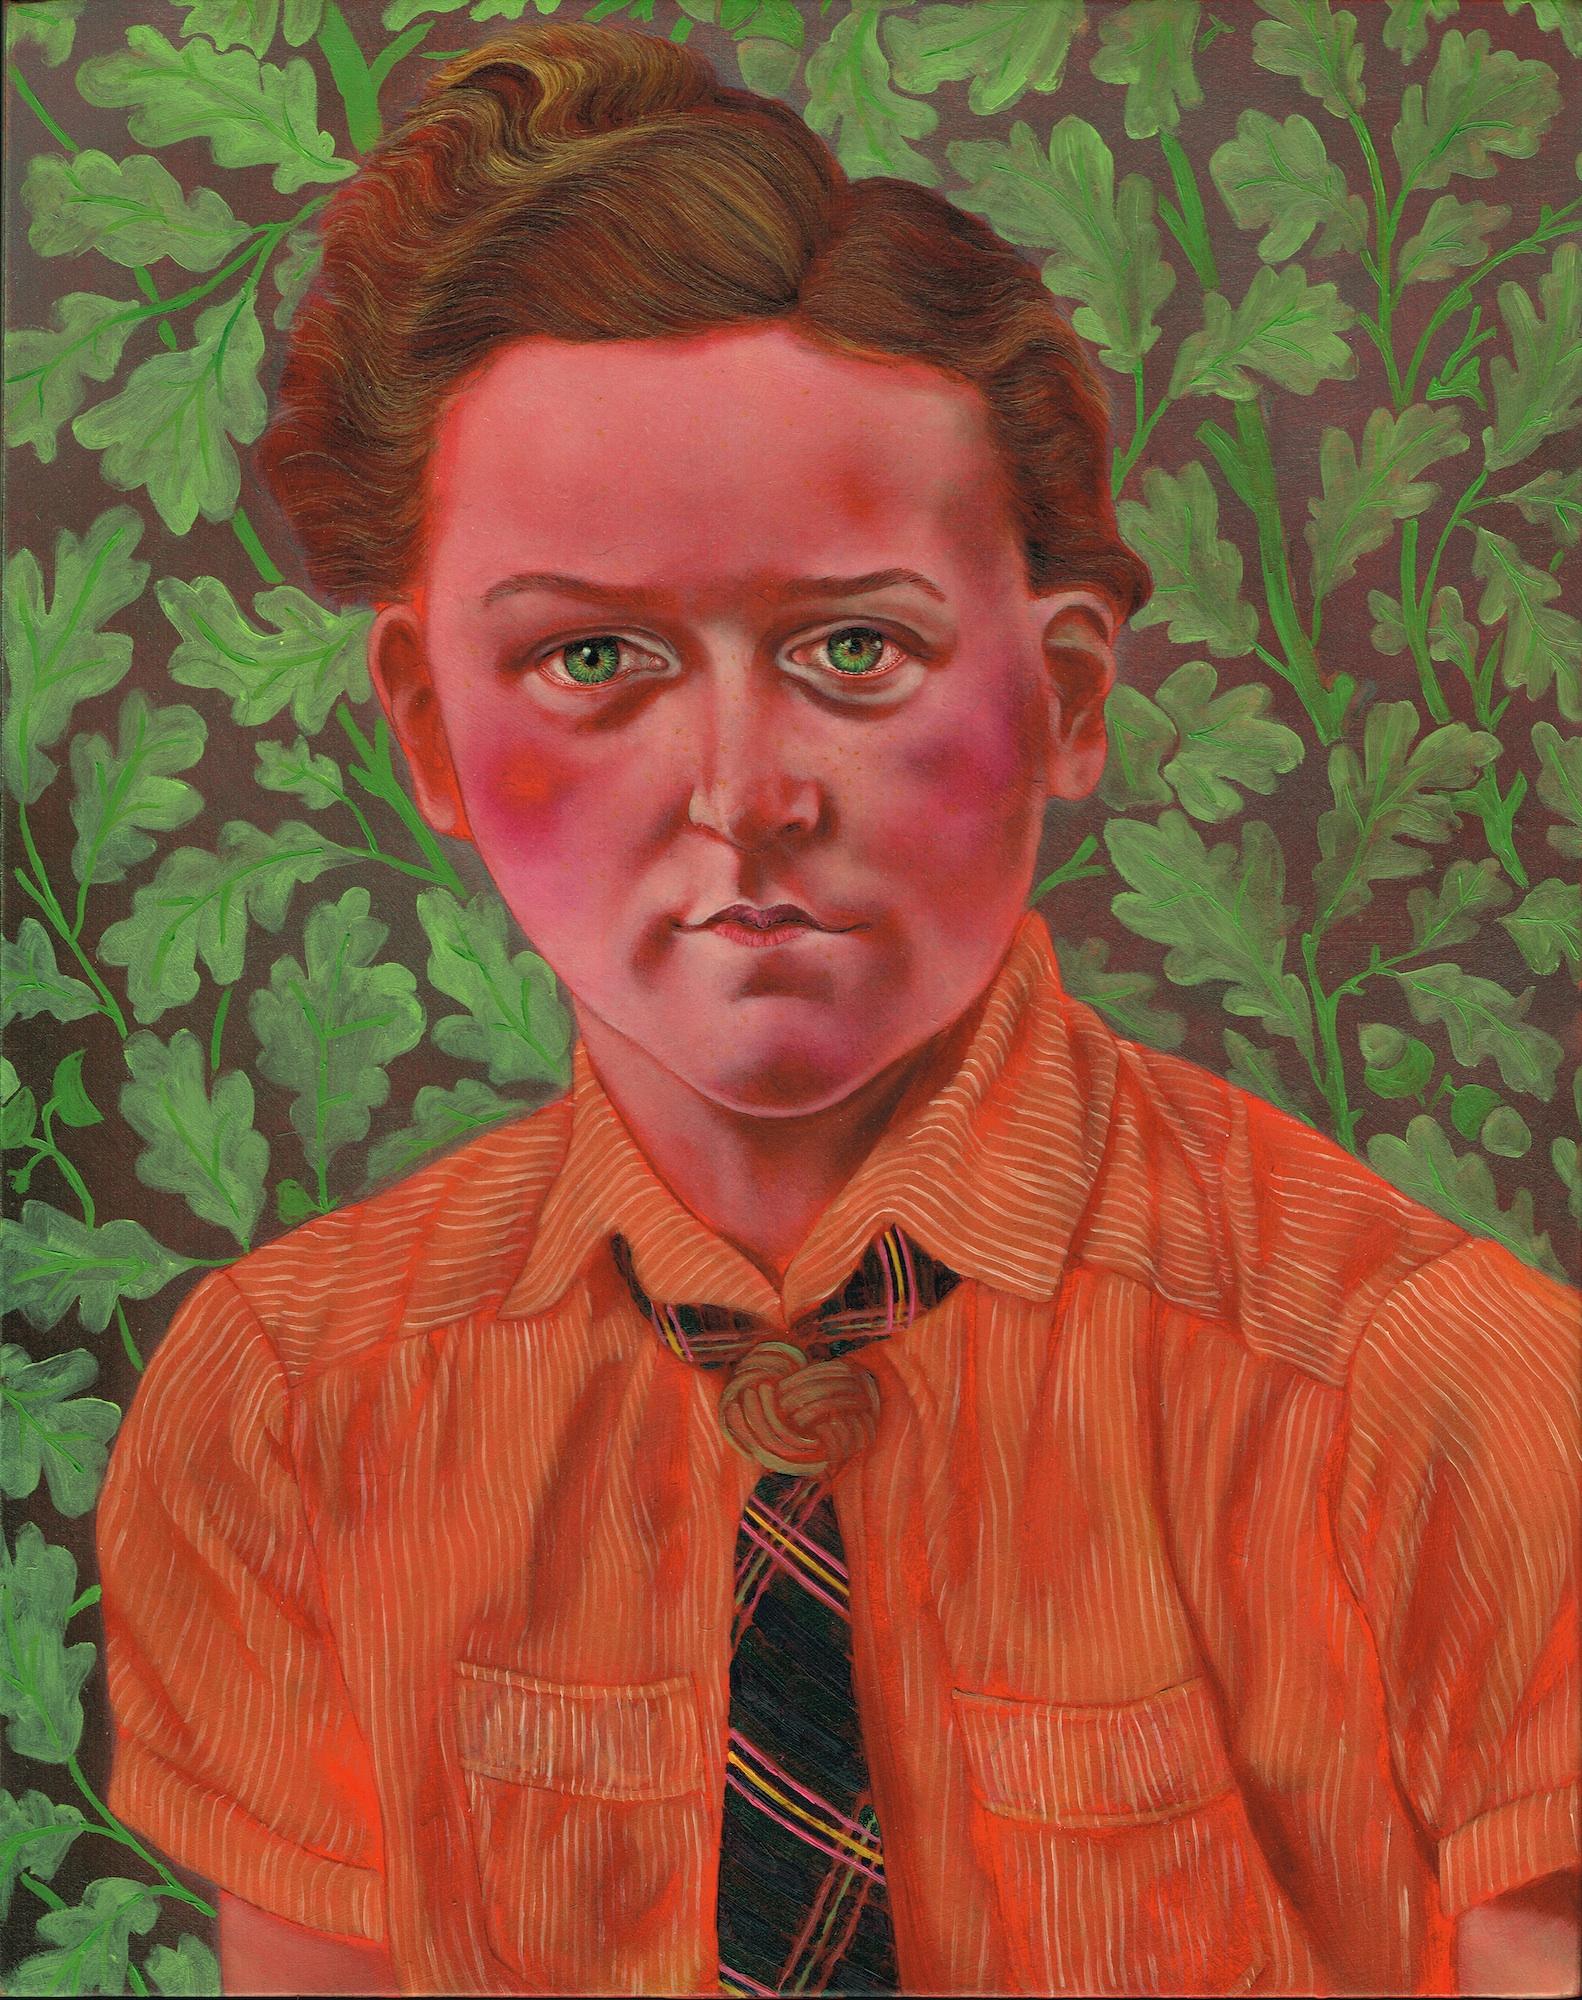 Dana Holst, Garconne, 2012, oil on panel, 10 x 8 inches.